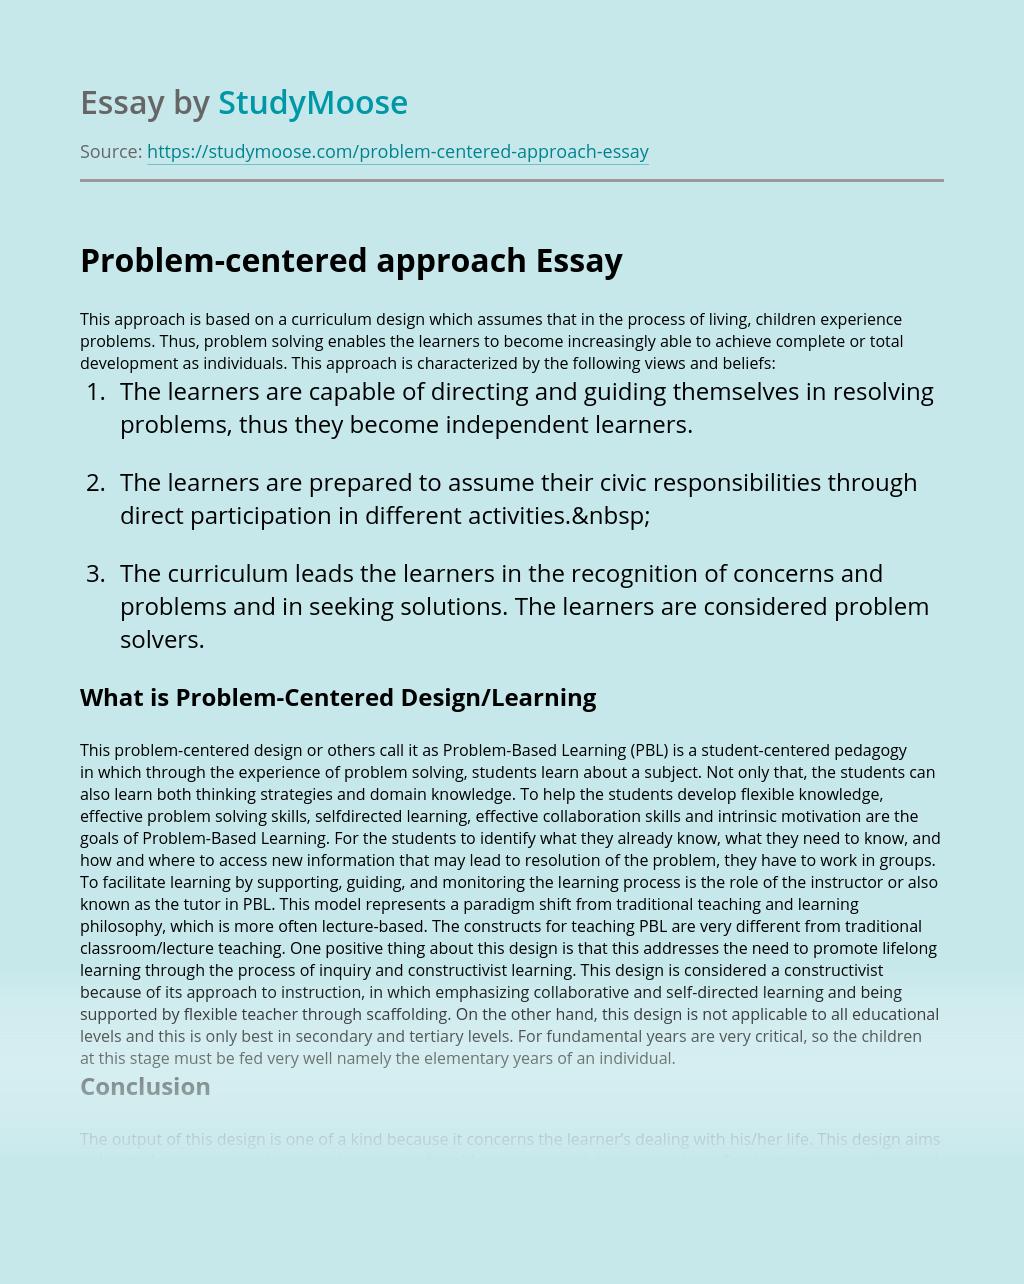 Problem-centered approach